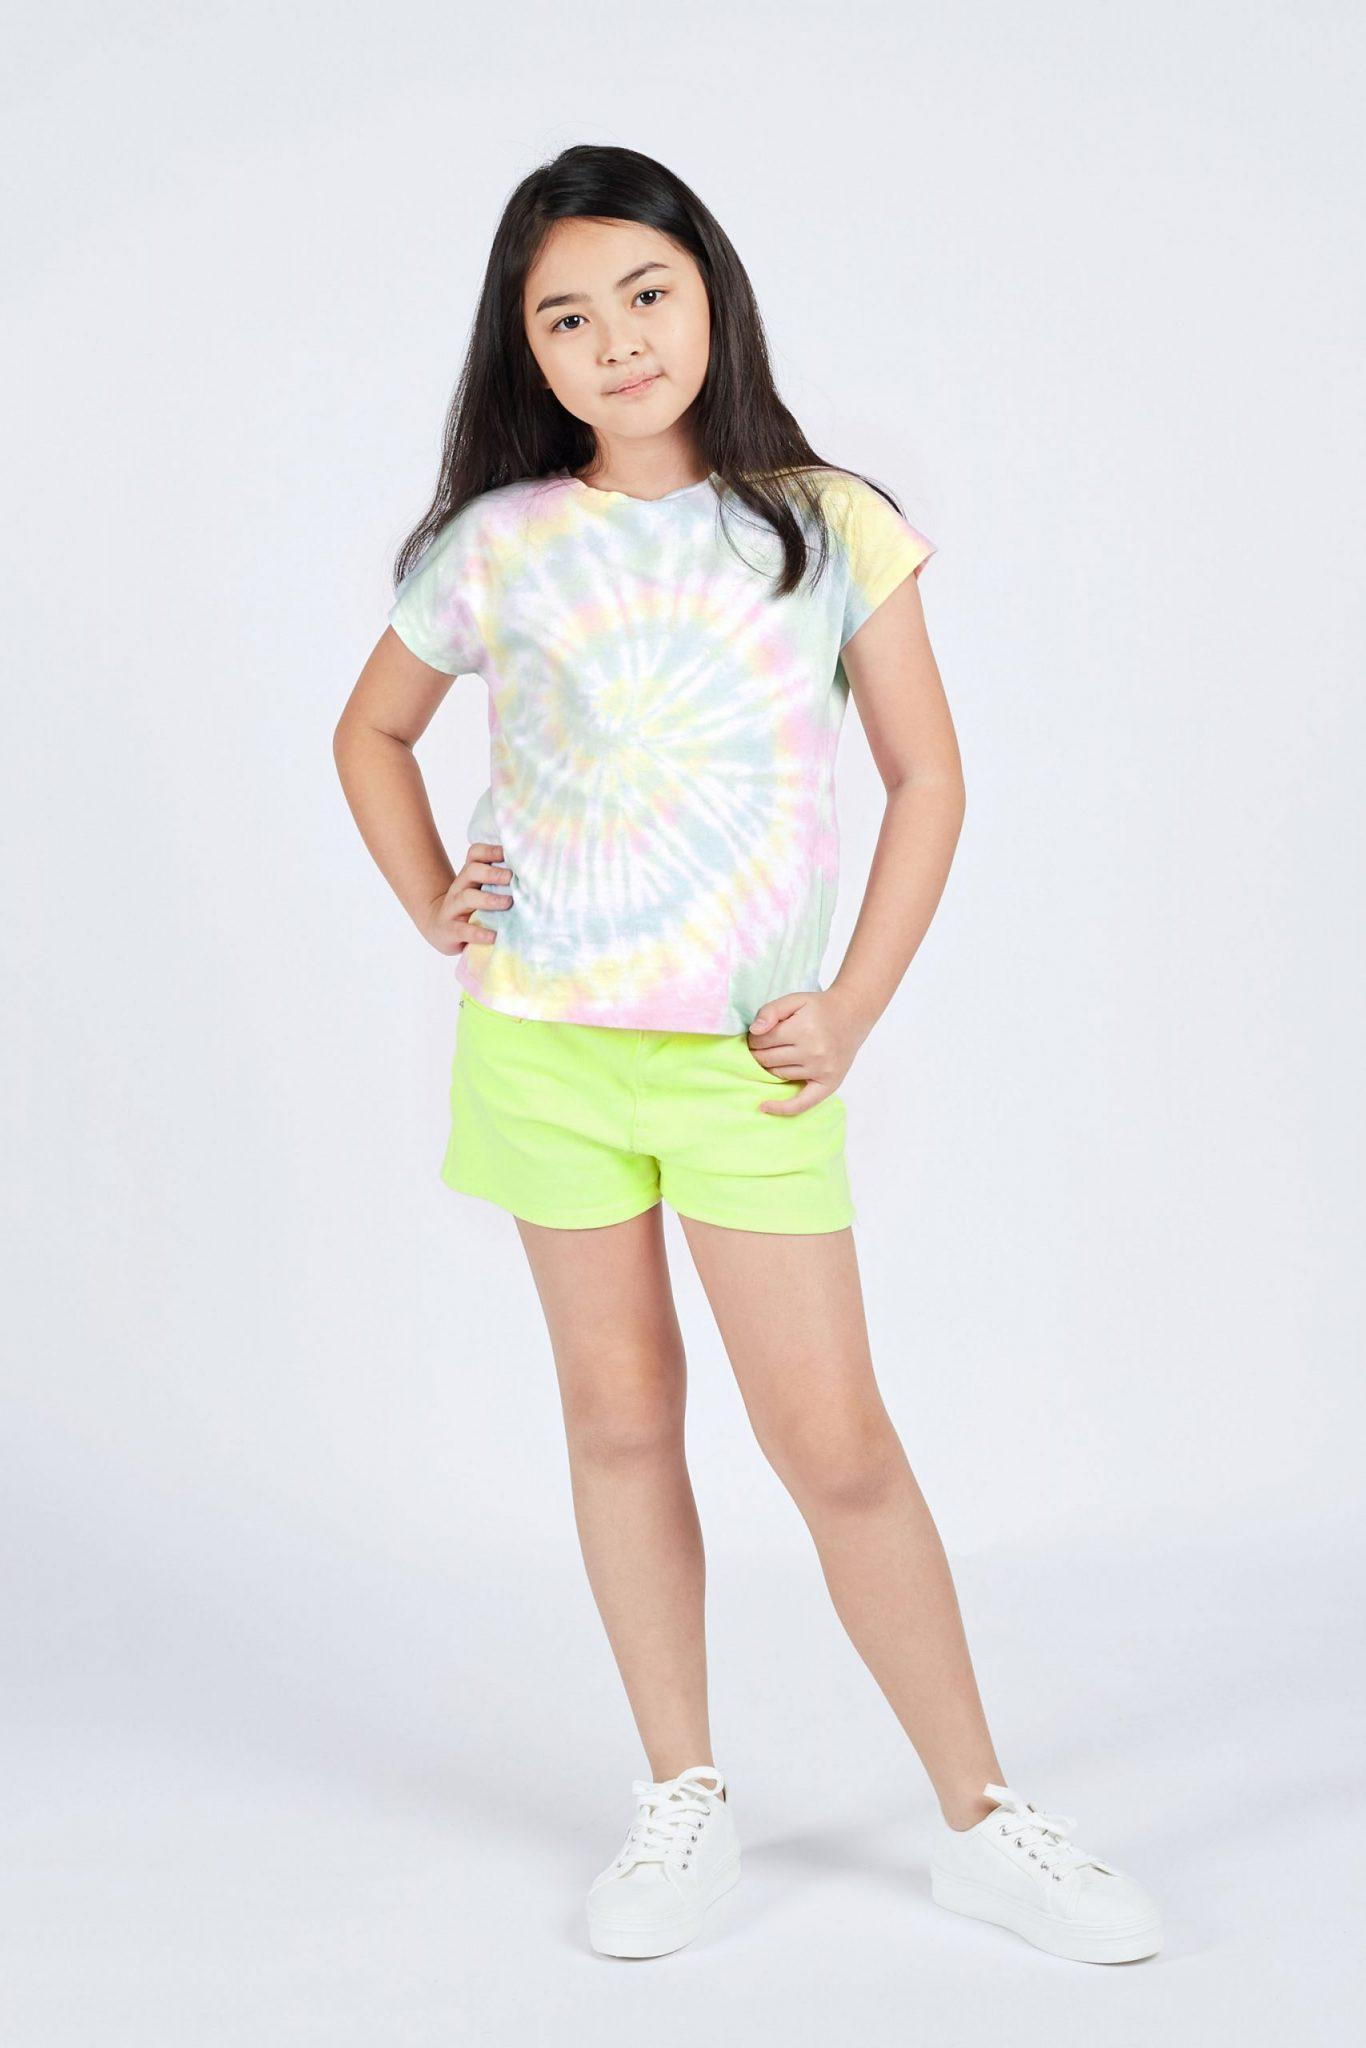 kids-studio-photography-the-jersey-shop-8